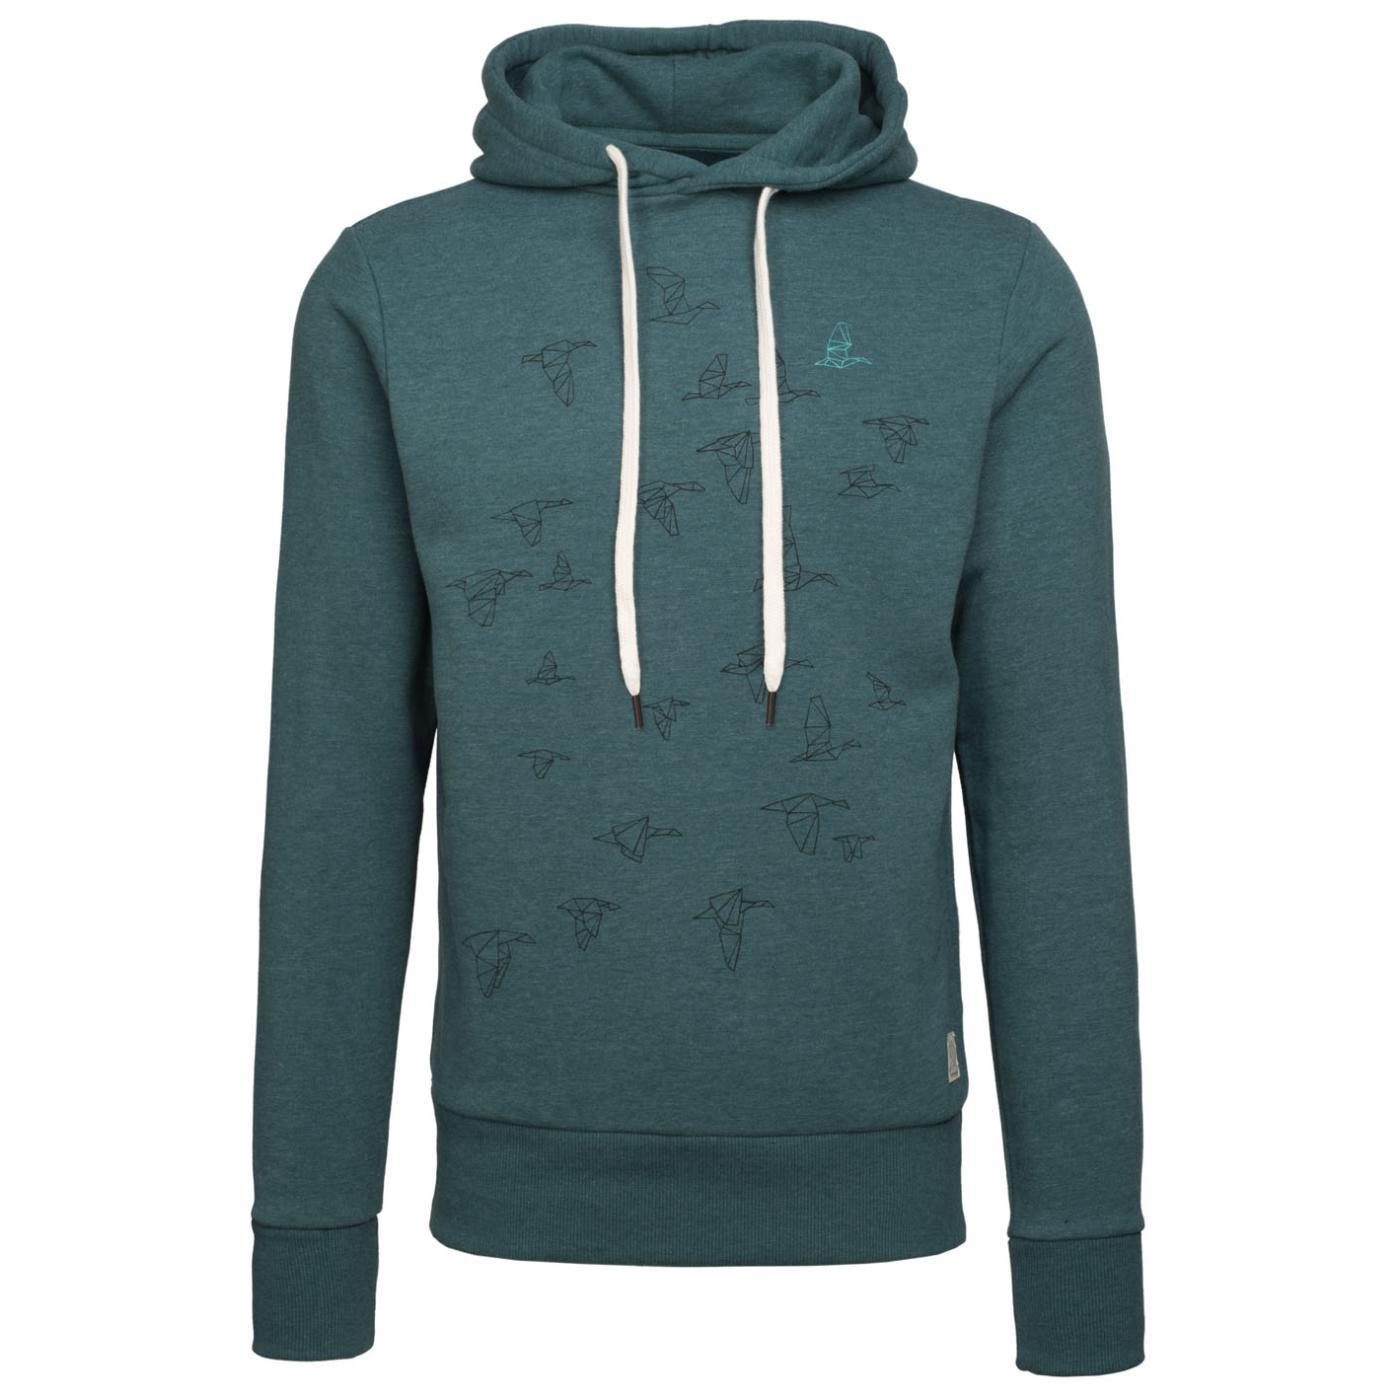 15-11-07-Sweater13